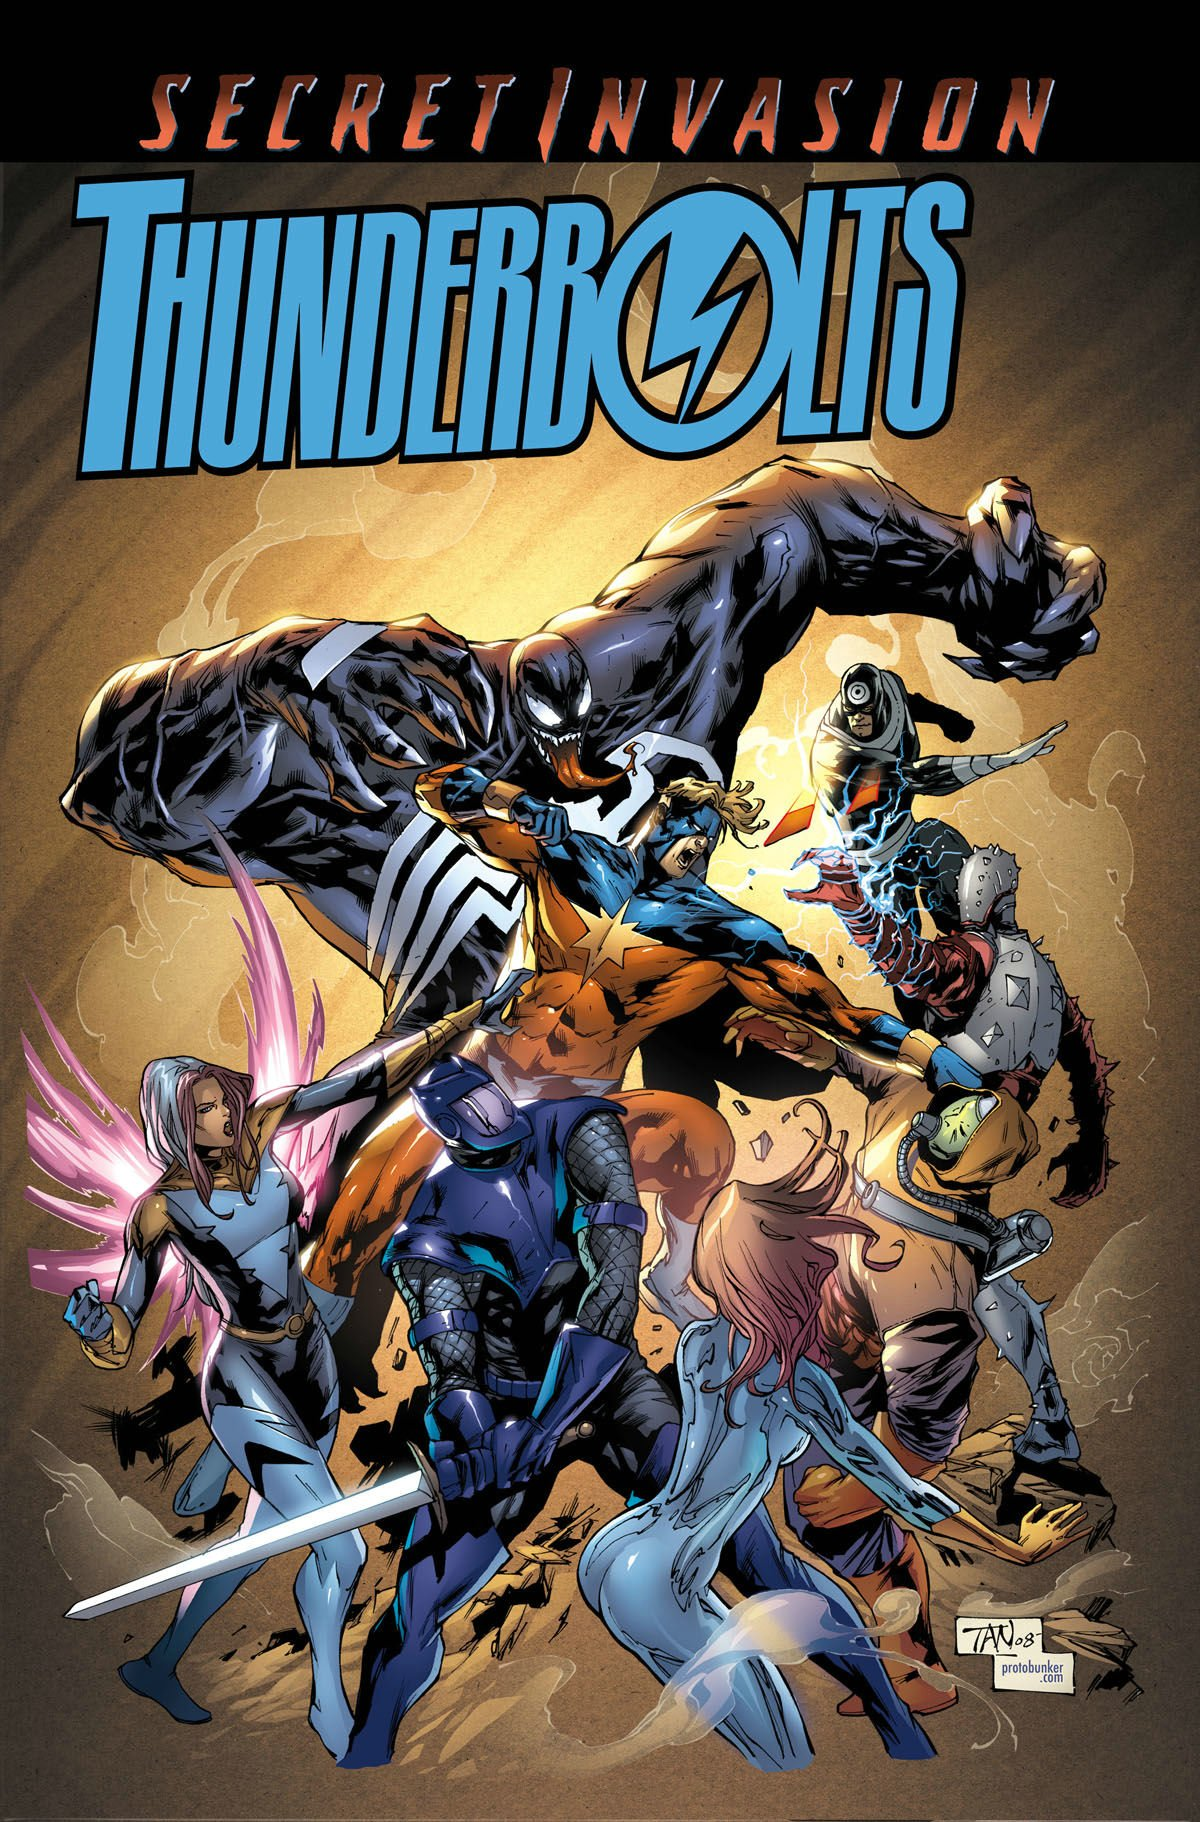 Thunderbolts, Vol. 3: Secret Invasion (v. 3) ebook